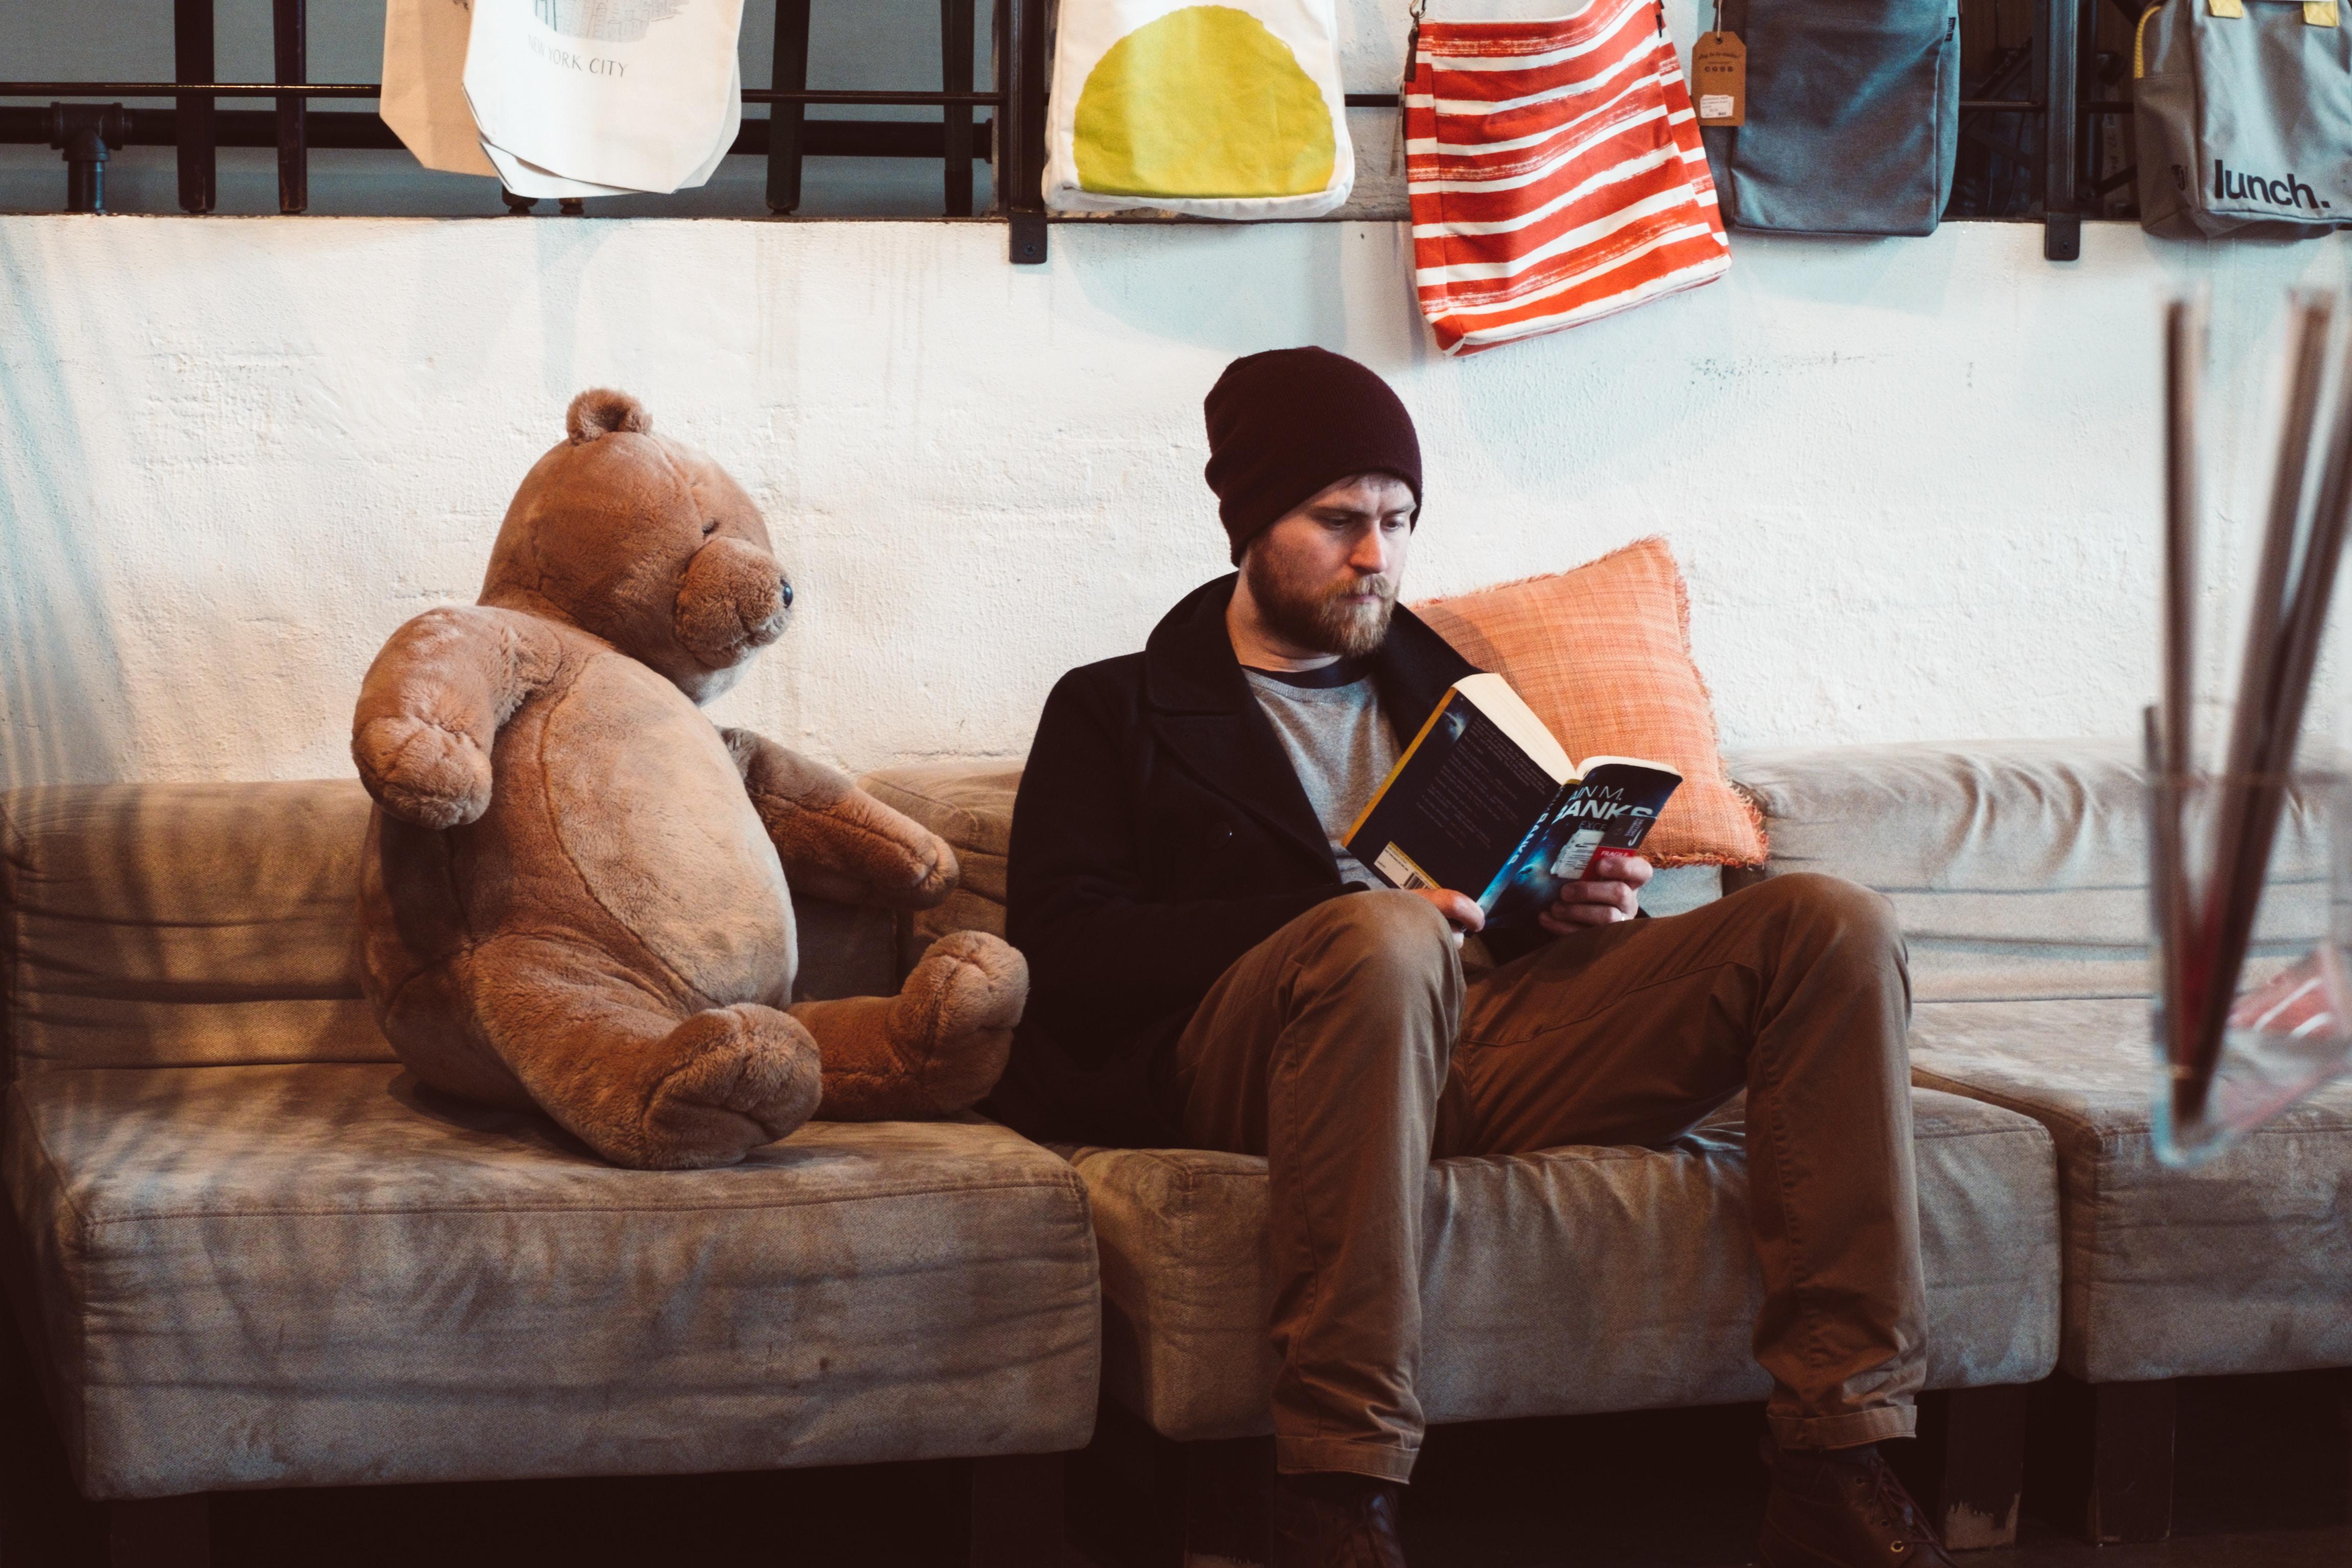 man sitting on sofa reading book near brown bear plush toy